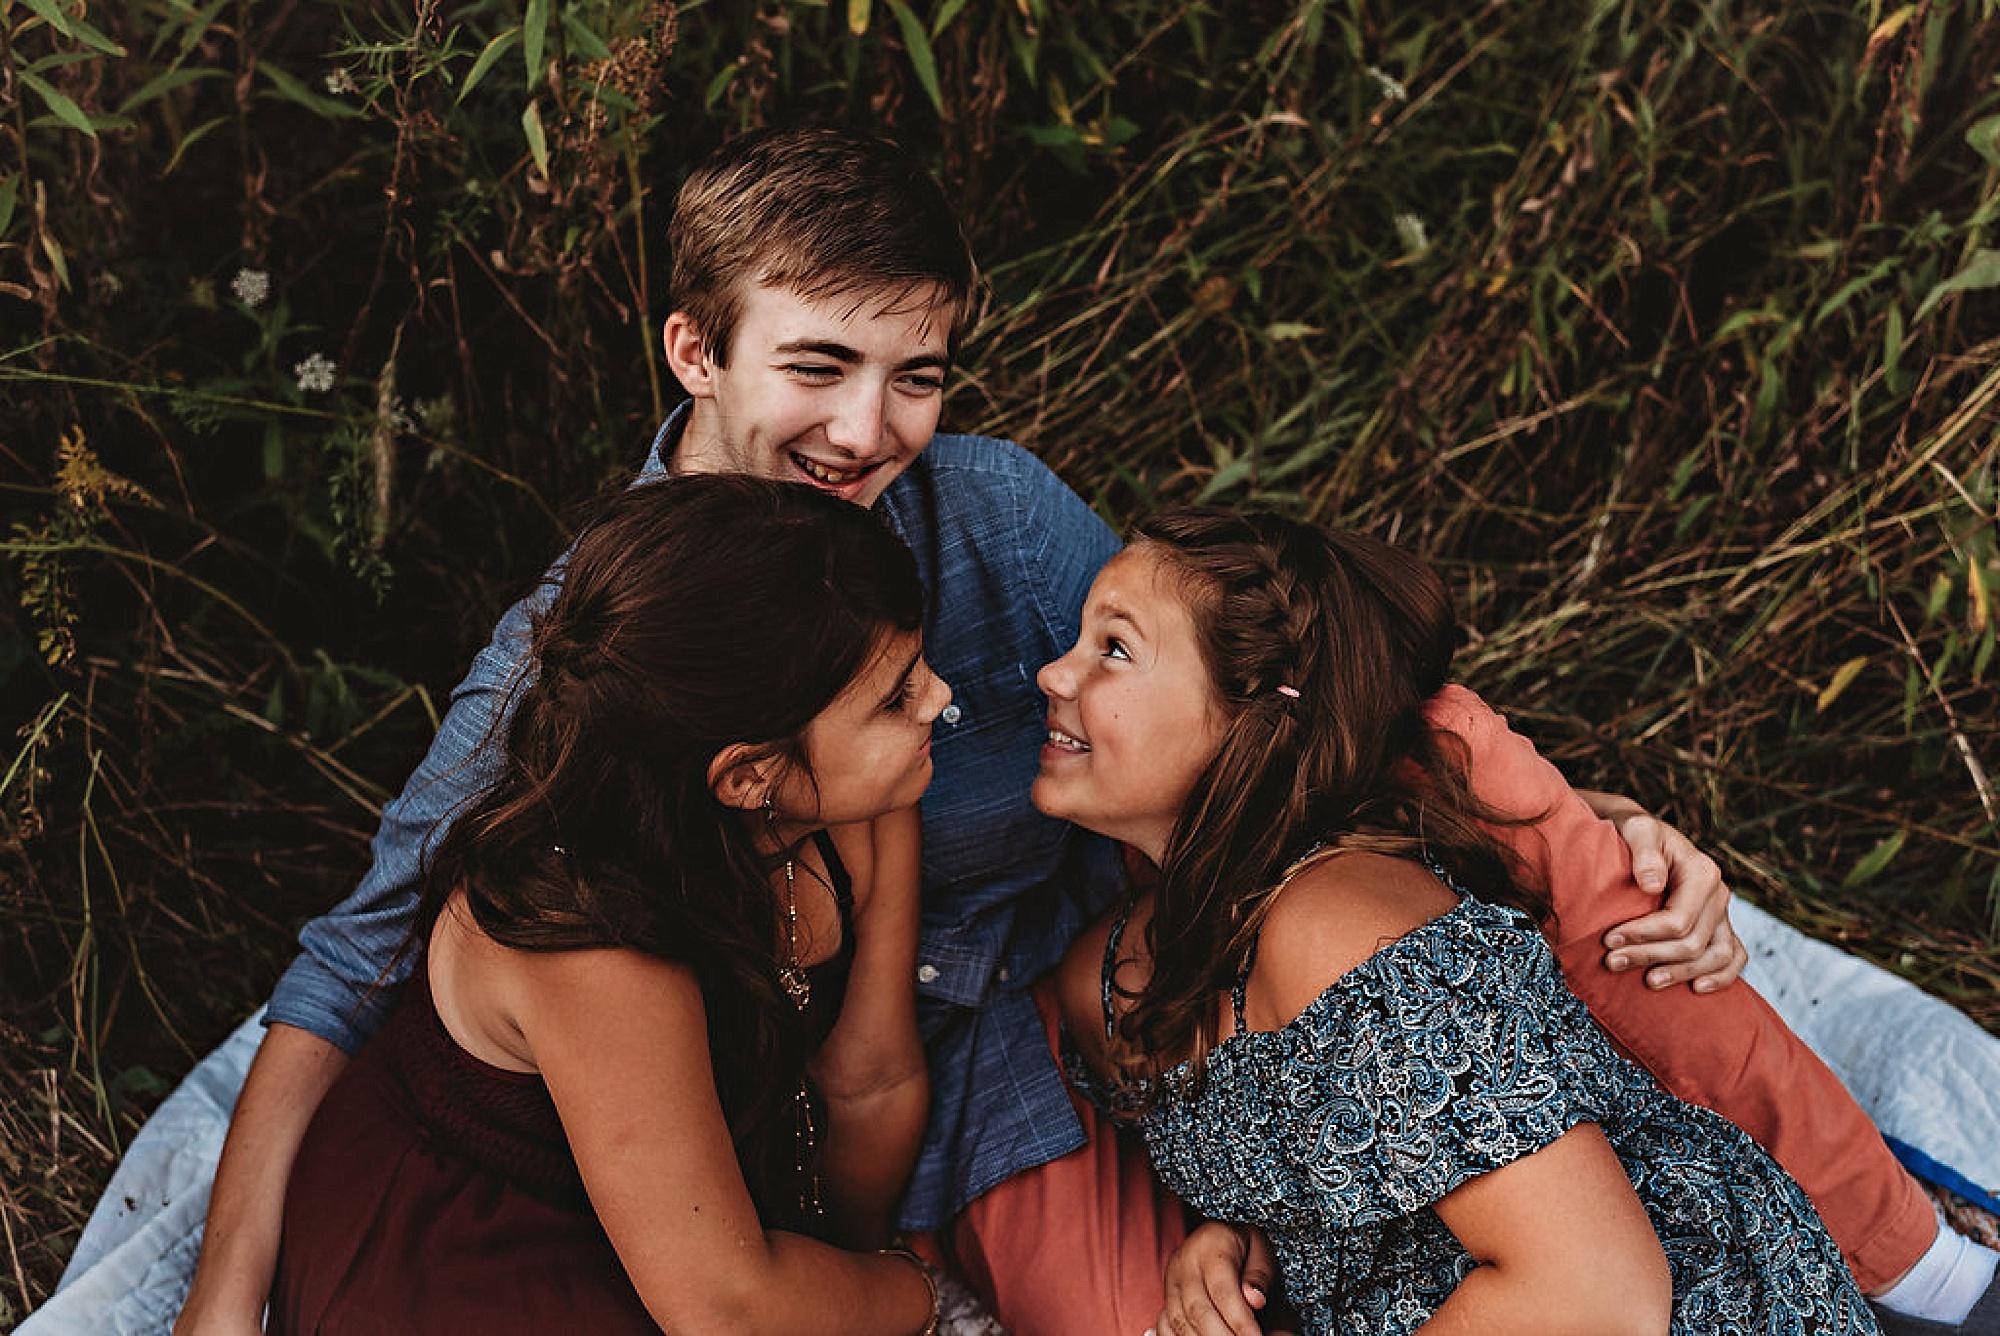 mcfredrick-family-lauren-grayson-akron-ohio_0008.jpg